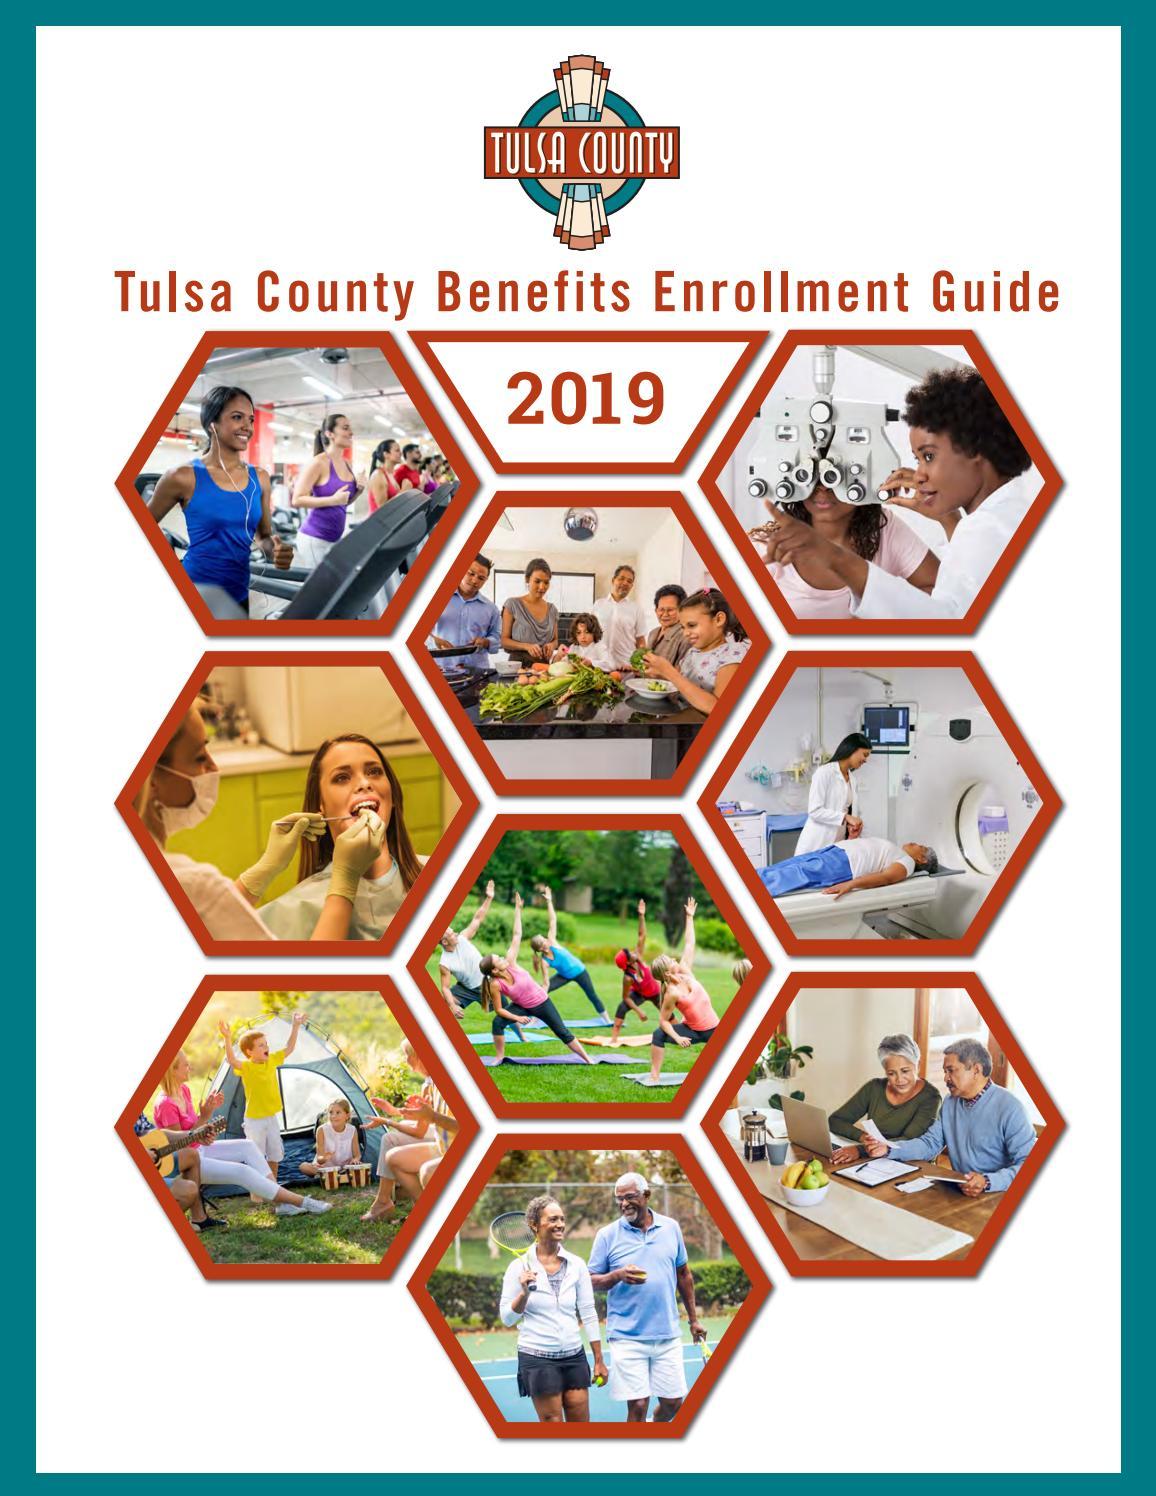 Tulsa County 2019 Benefits Guide by Tulsa County - issuu